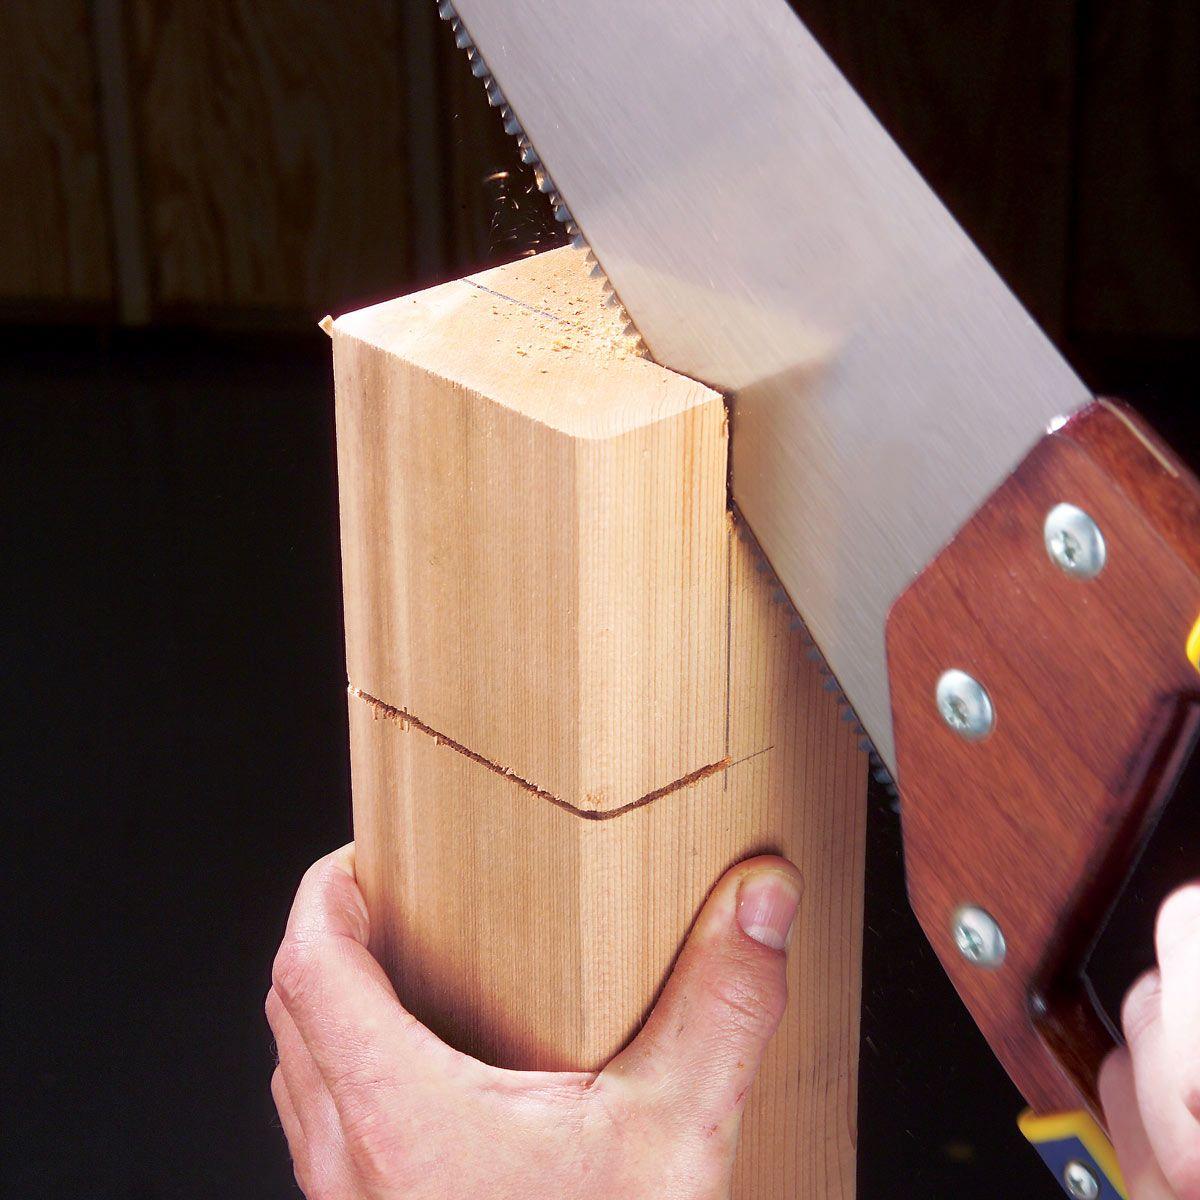 DIY Tutorial & Ideas from familyhandyman.com 2